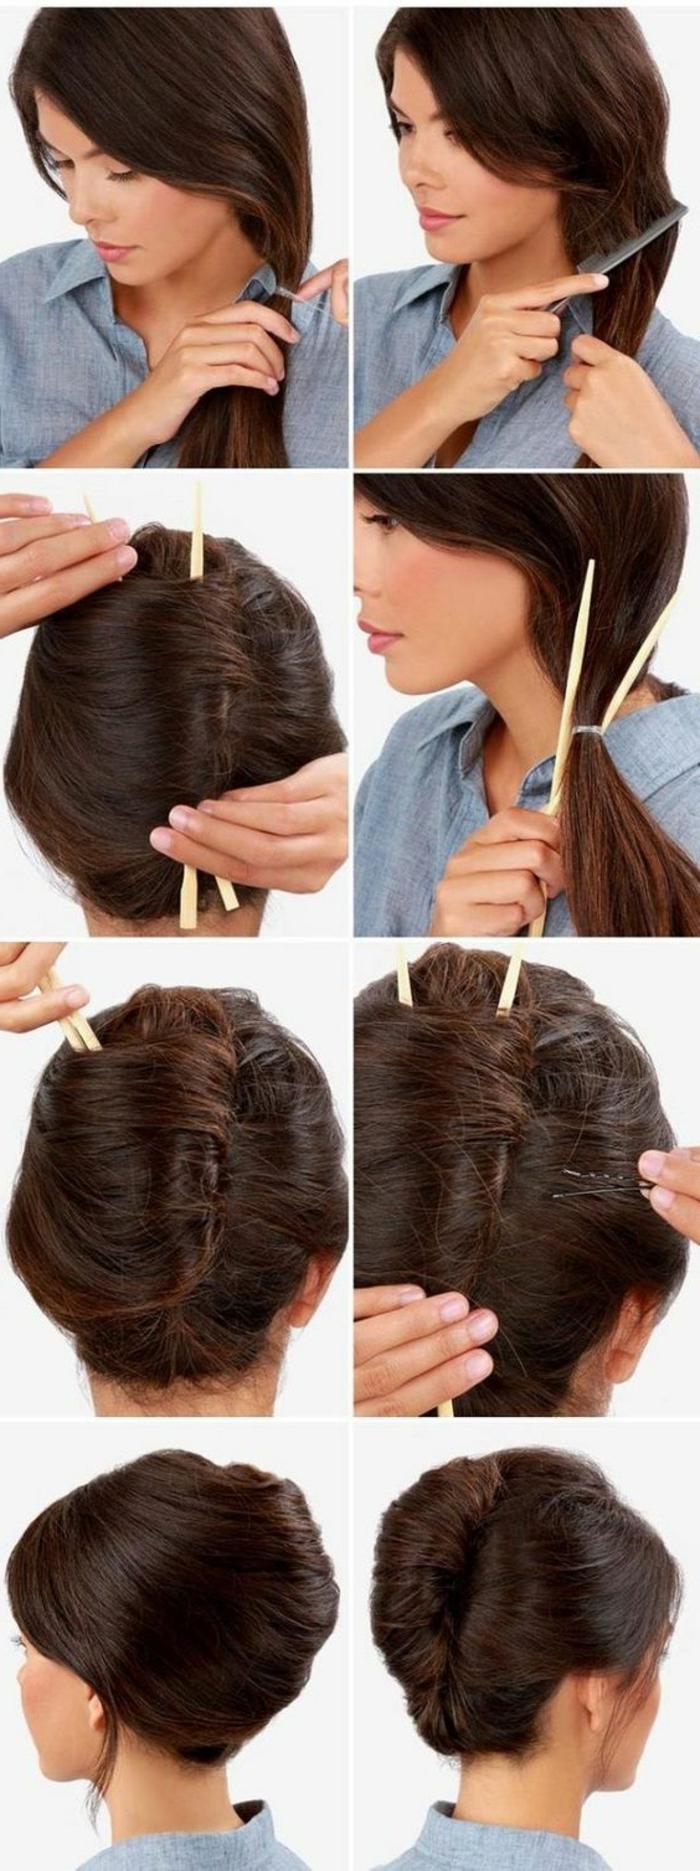 chignon-facile-a-faire-variante-coiffure-originale-et-rapide